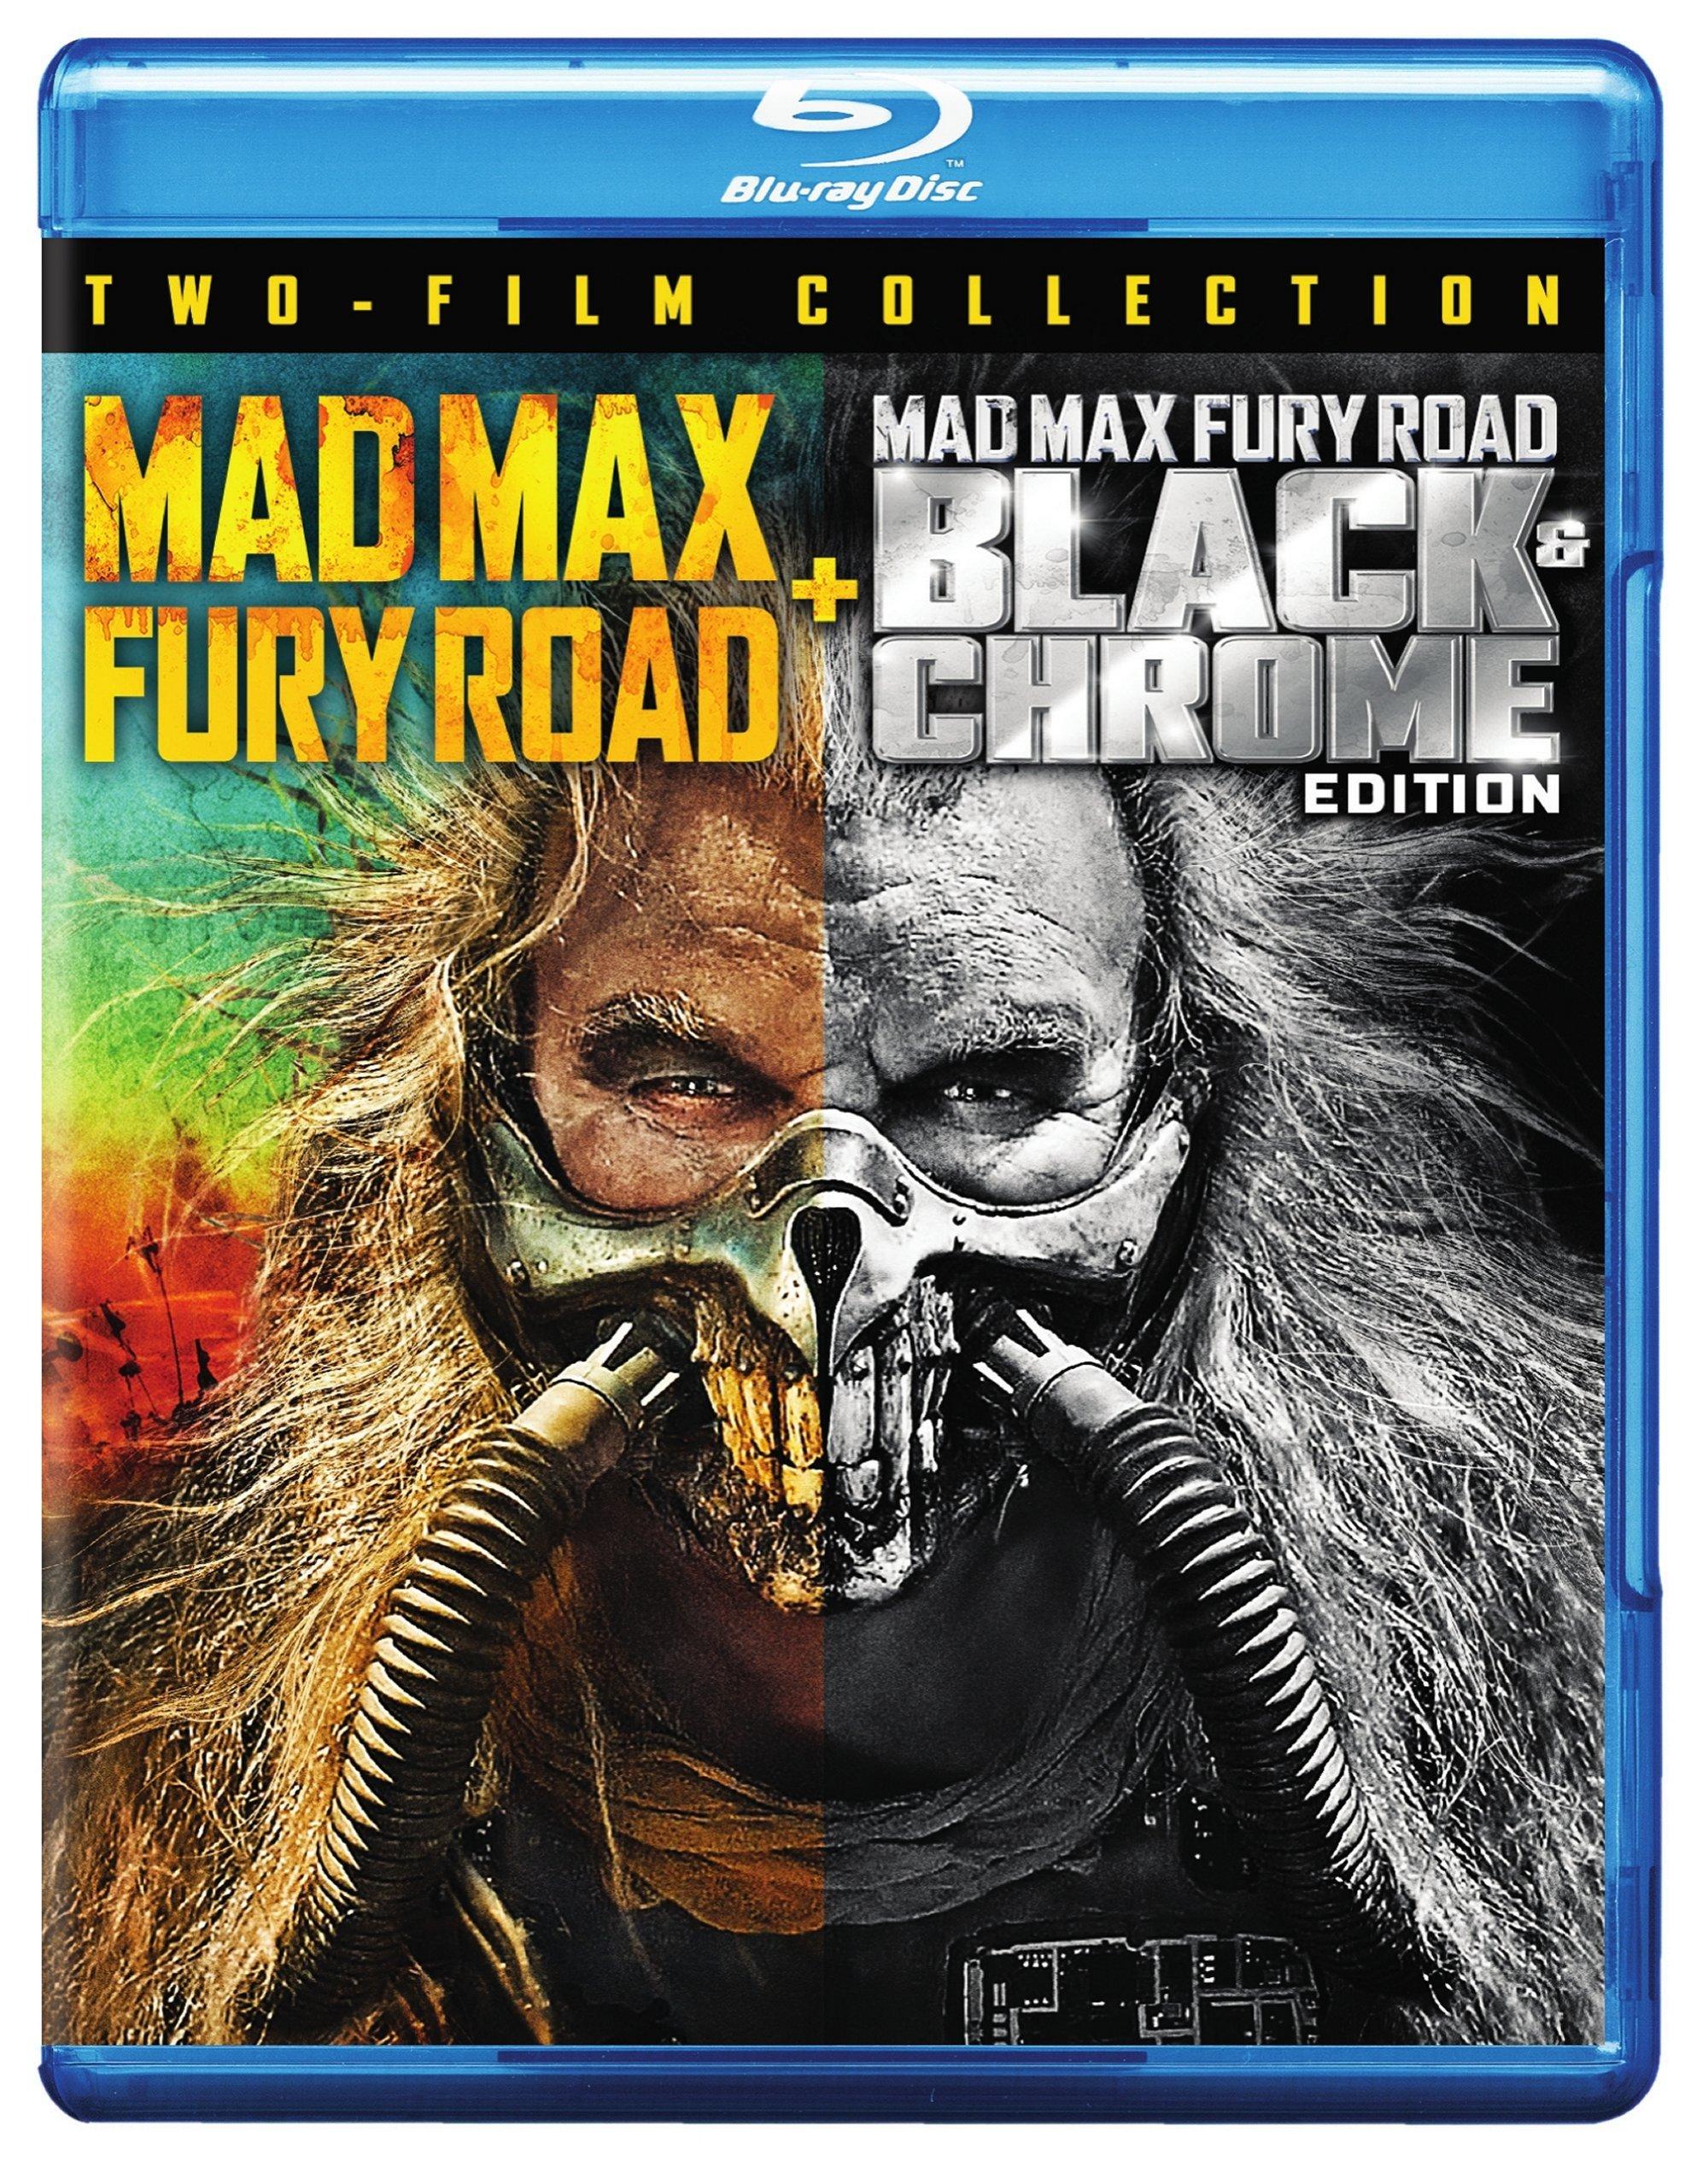 Blu-ray : Mad Max: Fury Road / Fury Road Black and Chrome (2 Pack, 2 Disc)